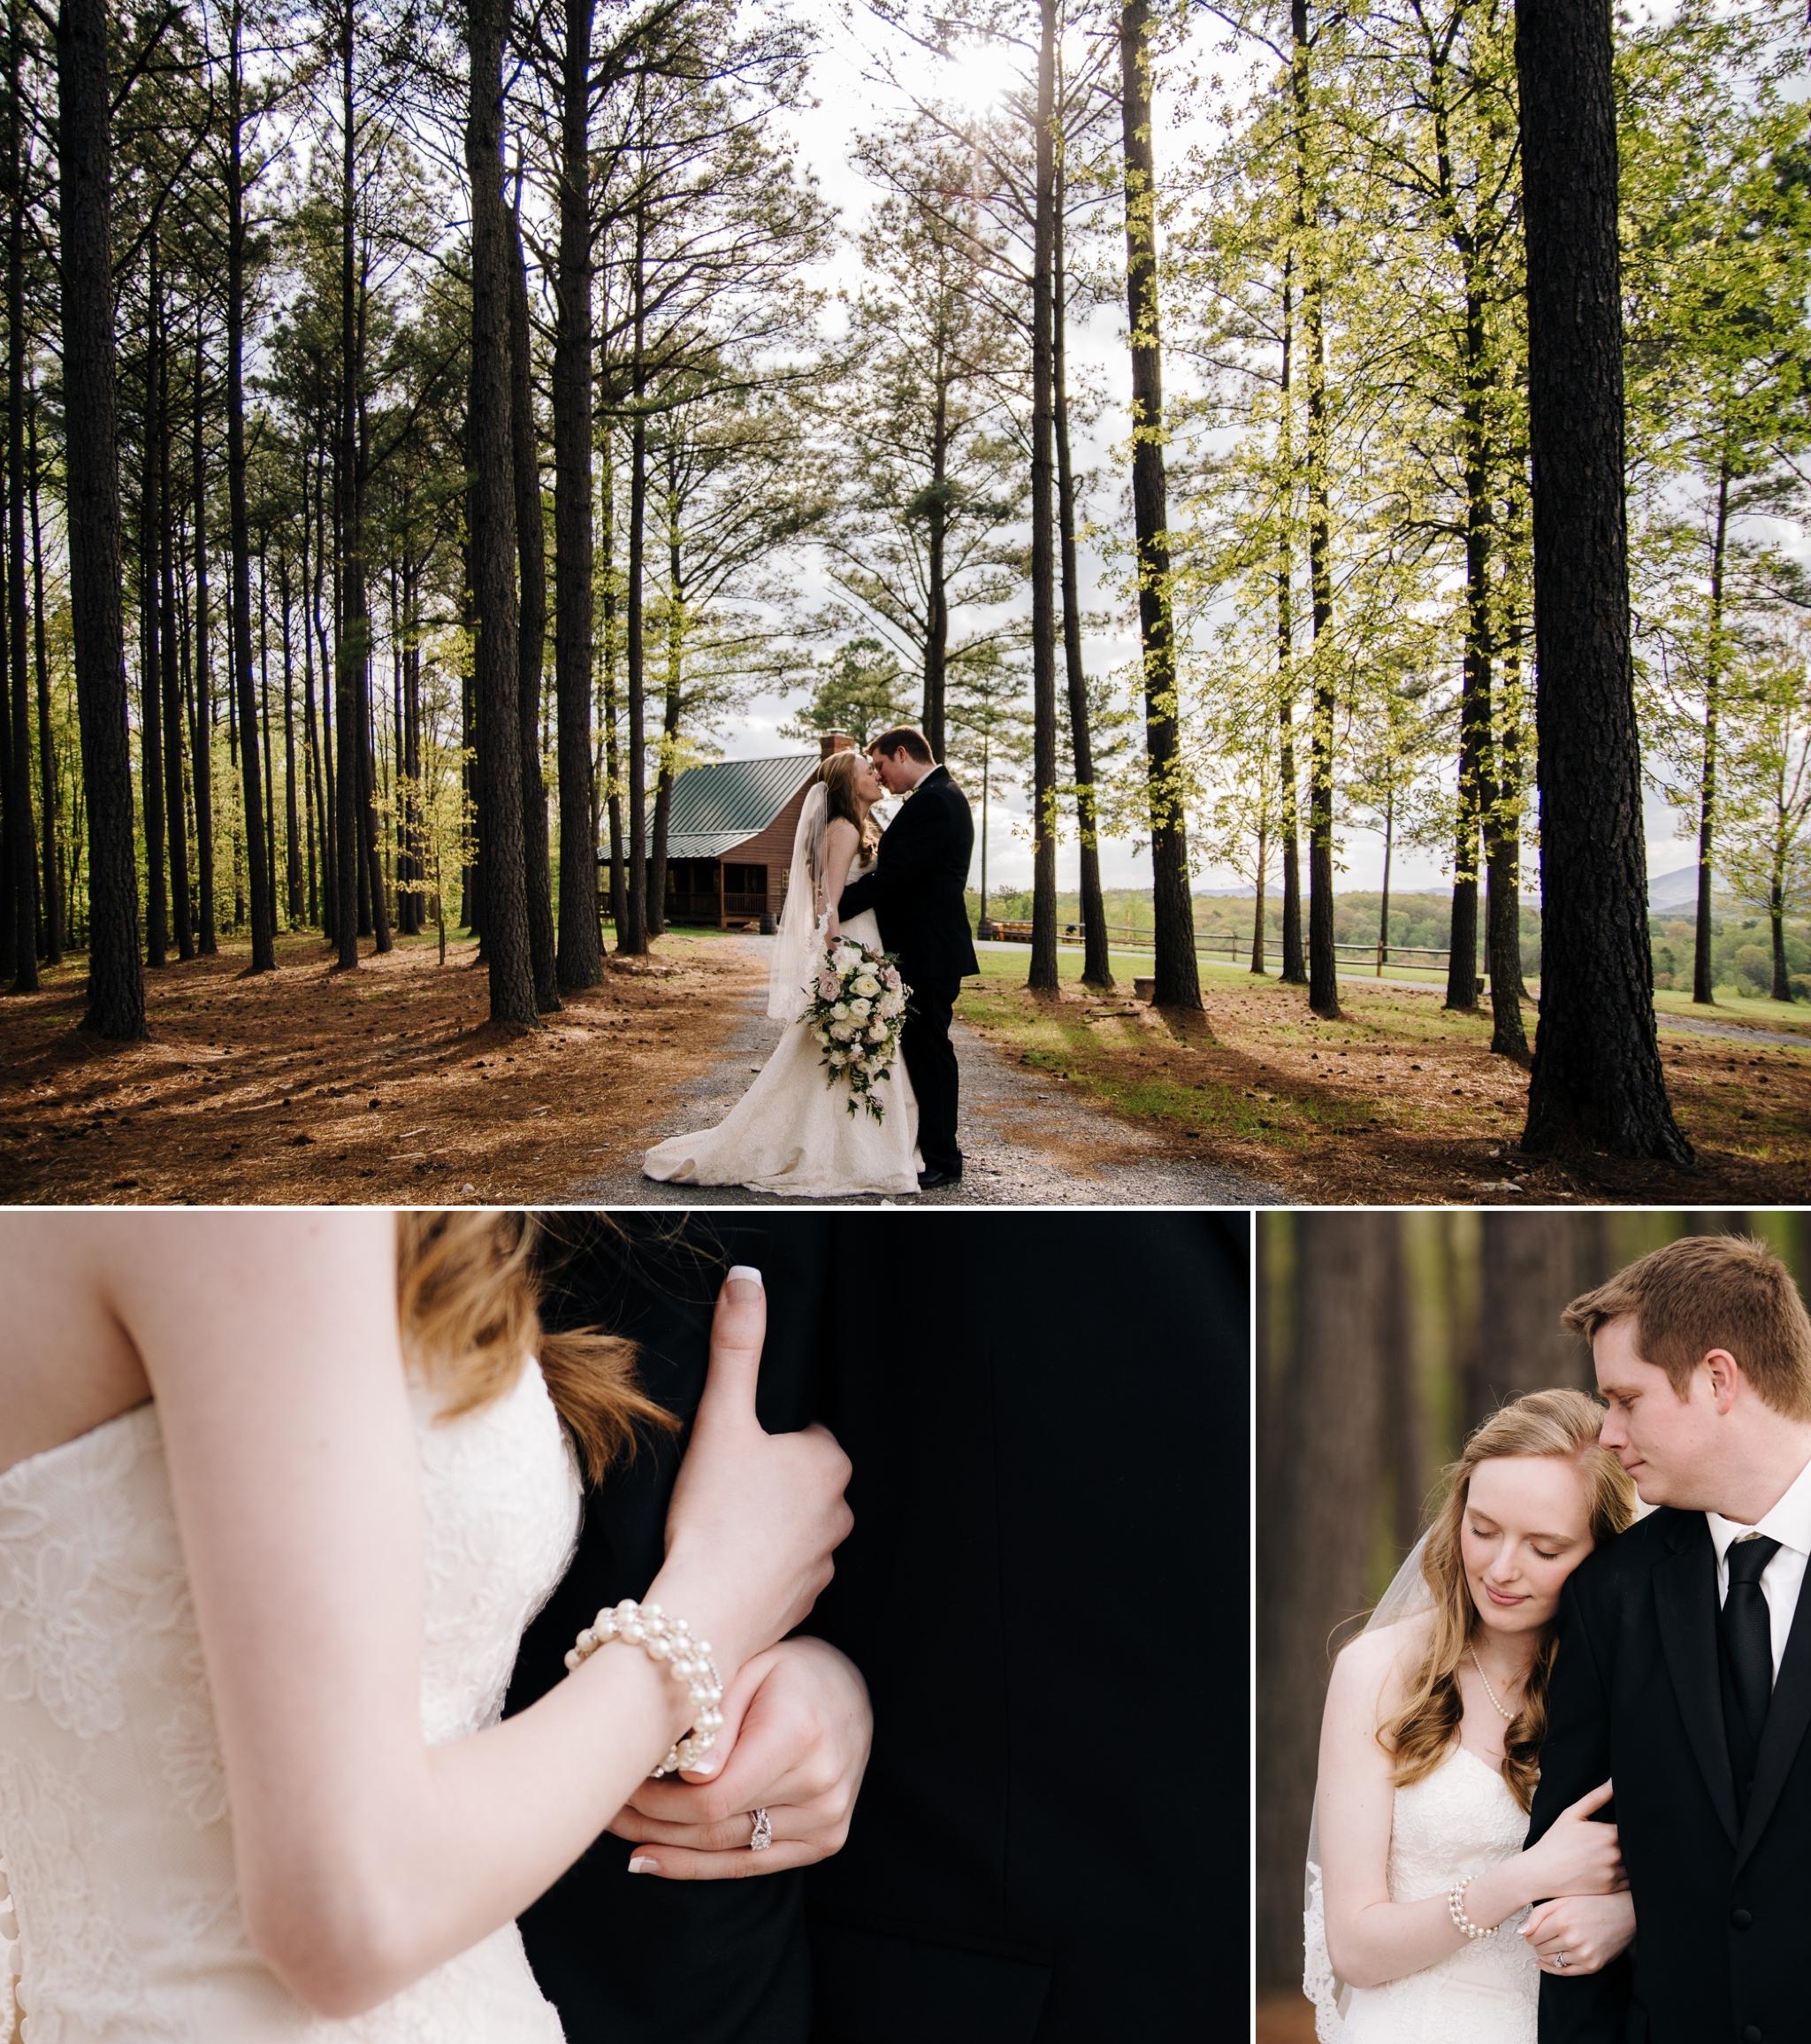 sierra vista black tie spring wedding lynchburg forest va jonathan hannah photography.jpg